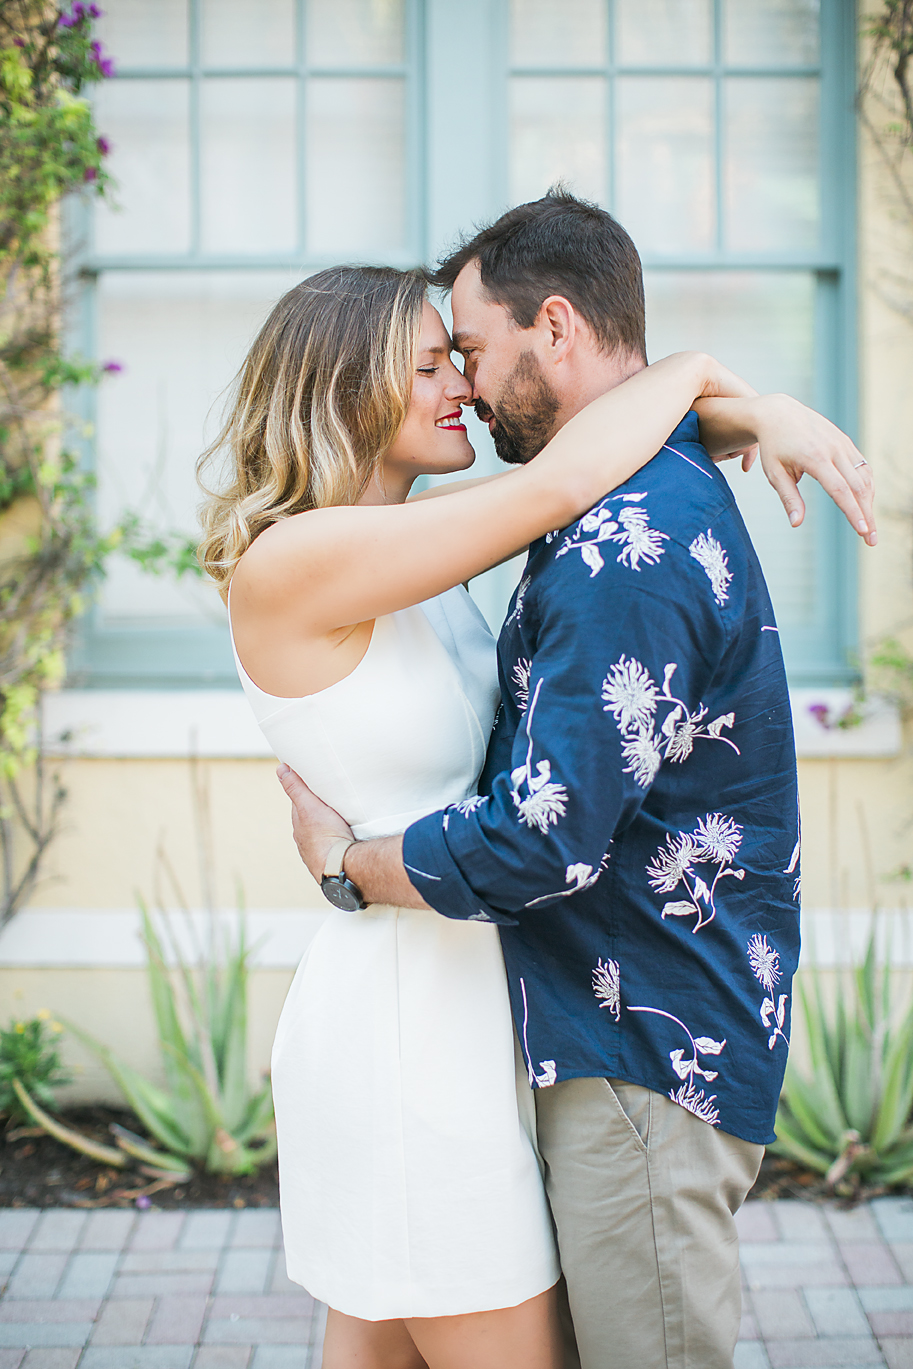 Alanna + Fred, Sarasota Engagement Photographer, Sarasota Wedding Photographer, PRINT IMAGES Emily & Co. Photography (255).jpg